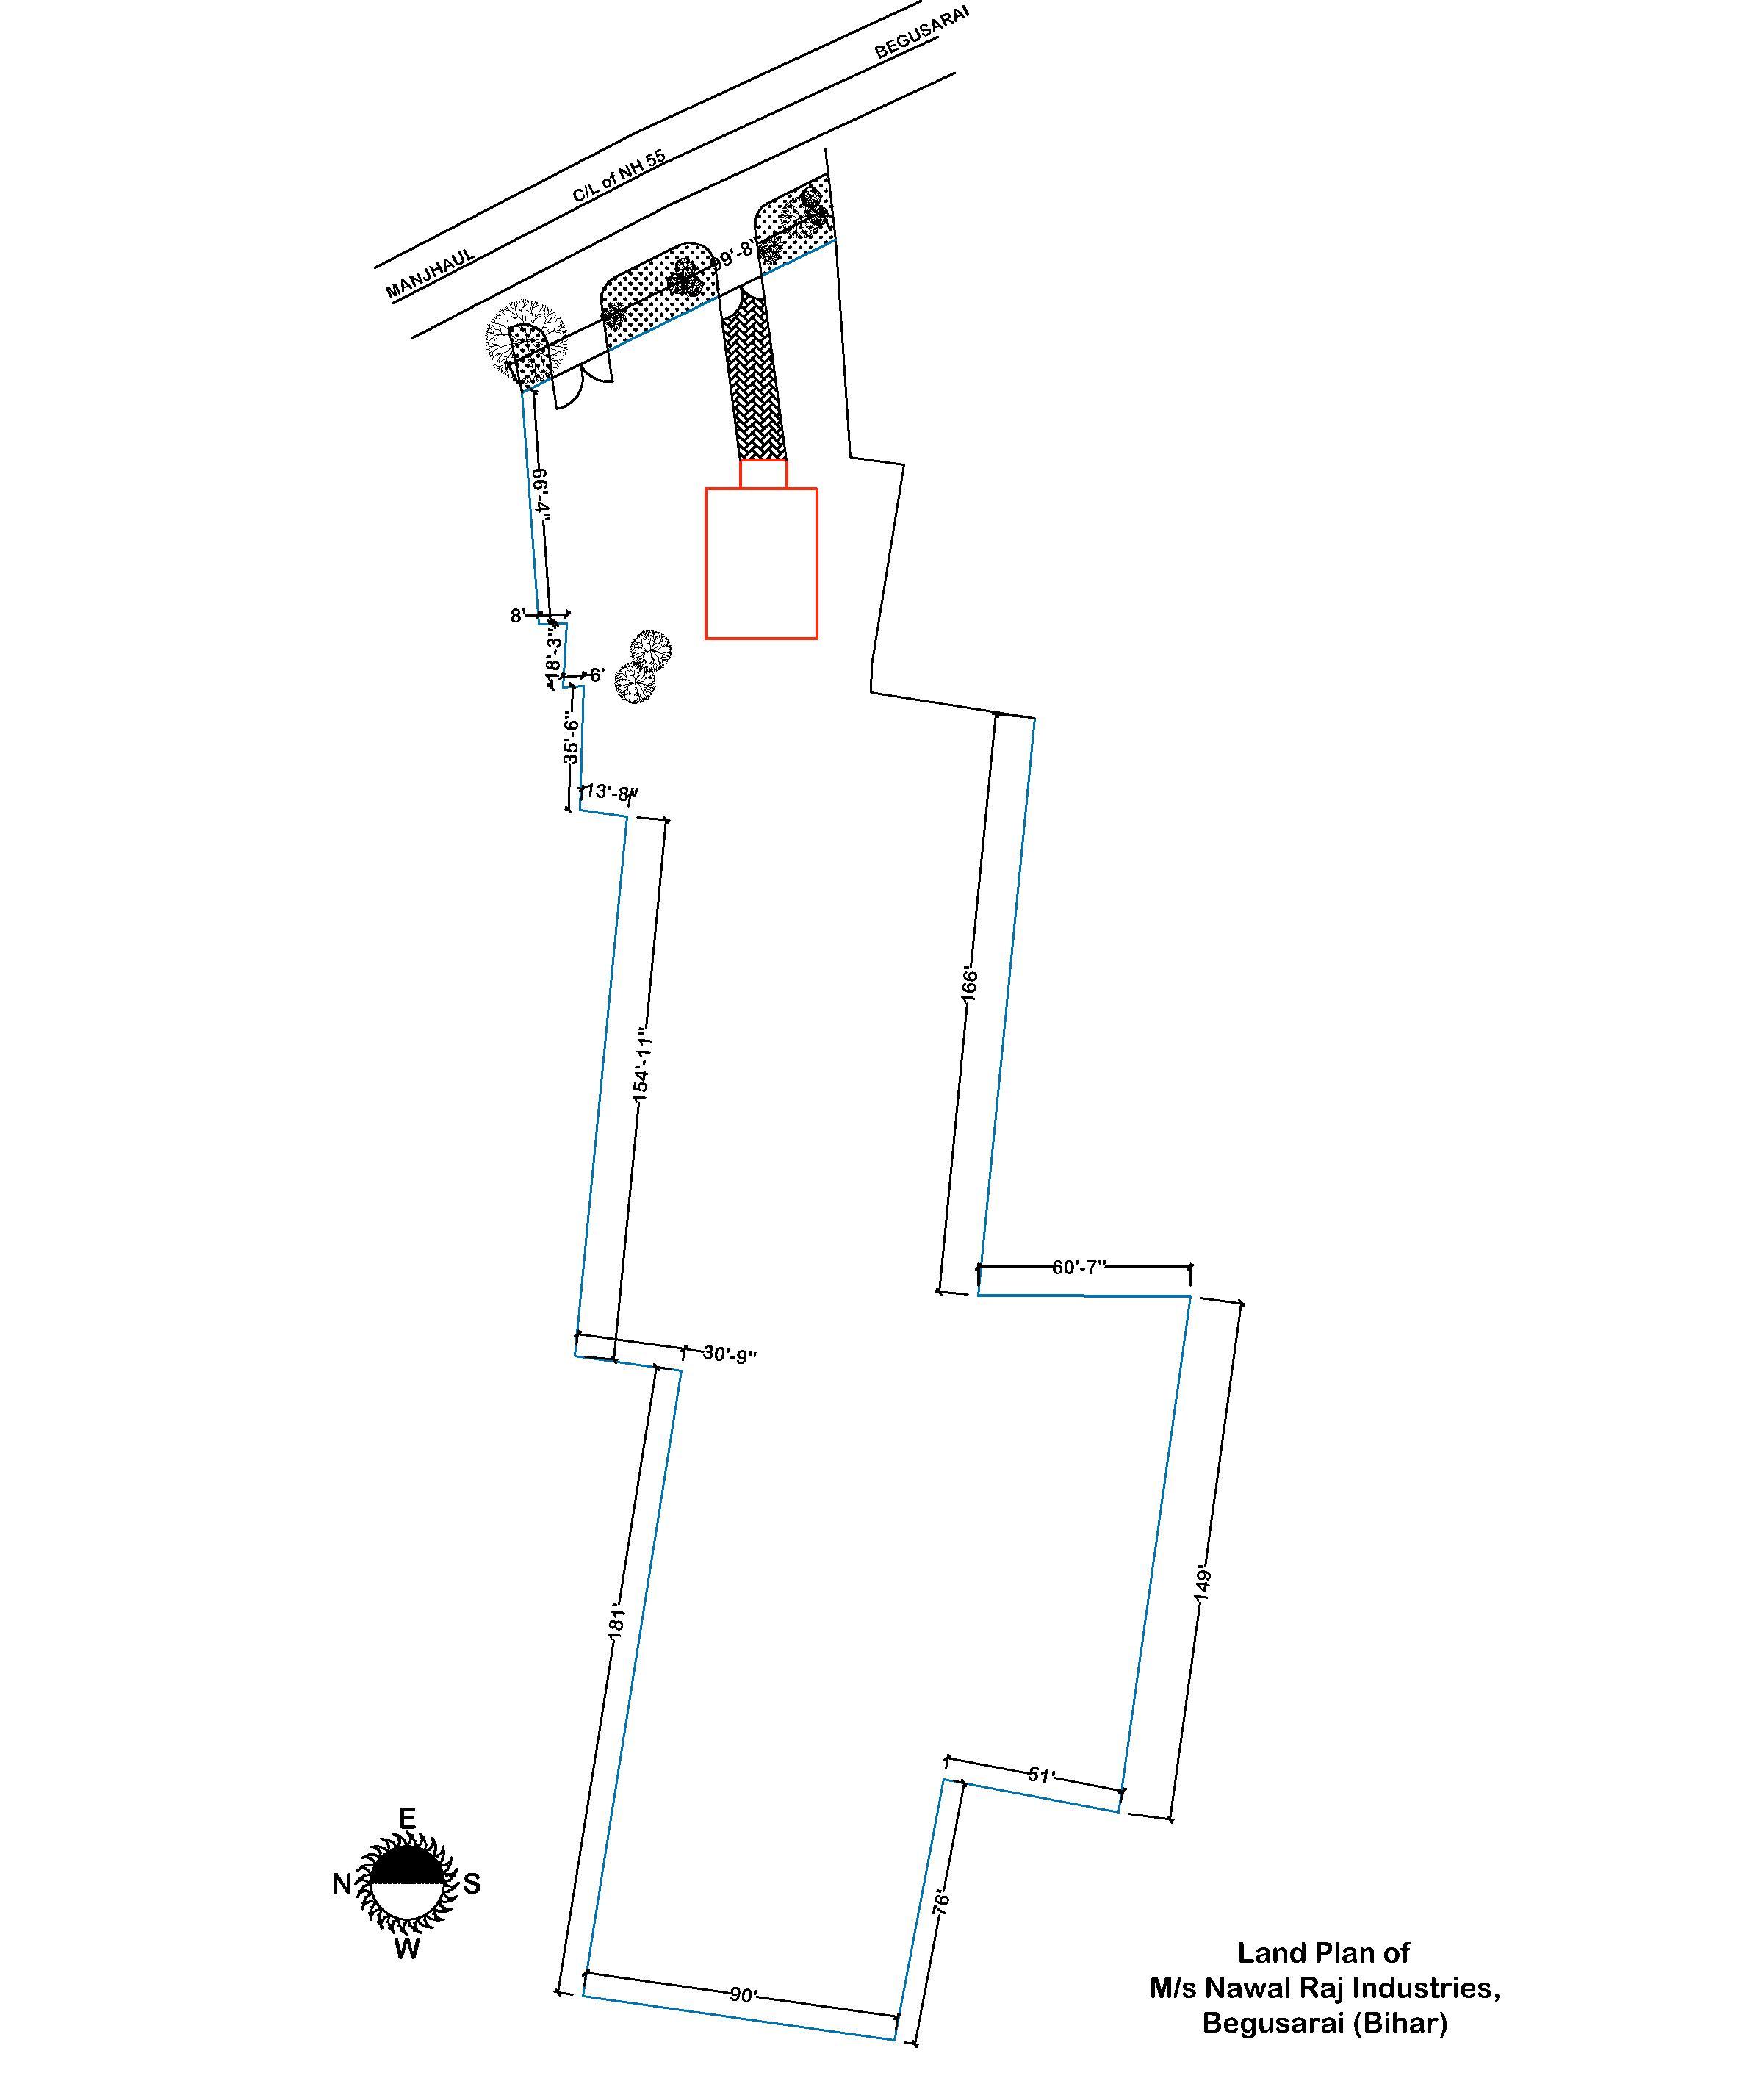 58000 Sq-ft Plot on Rent - SH - 55 -Begusarai - Manjhaul - Rosera-